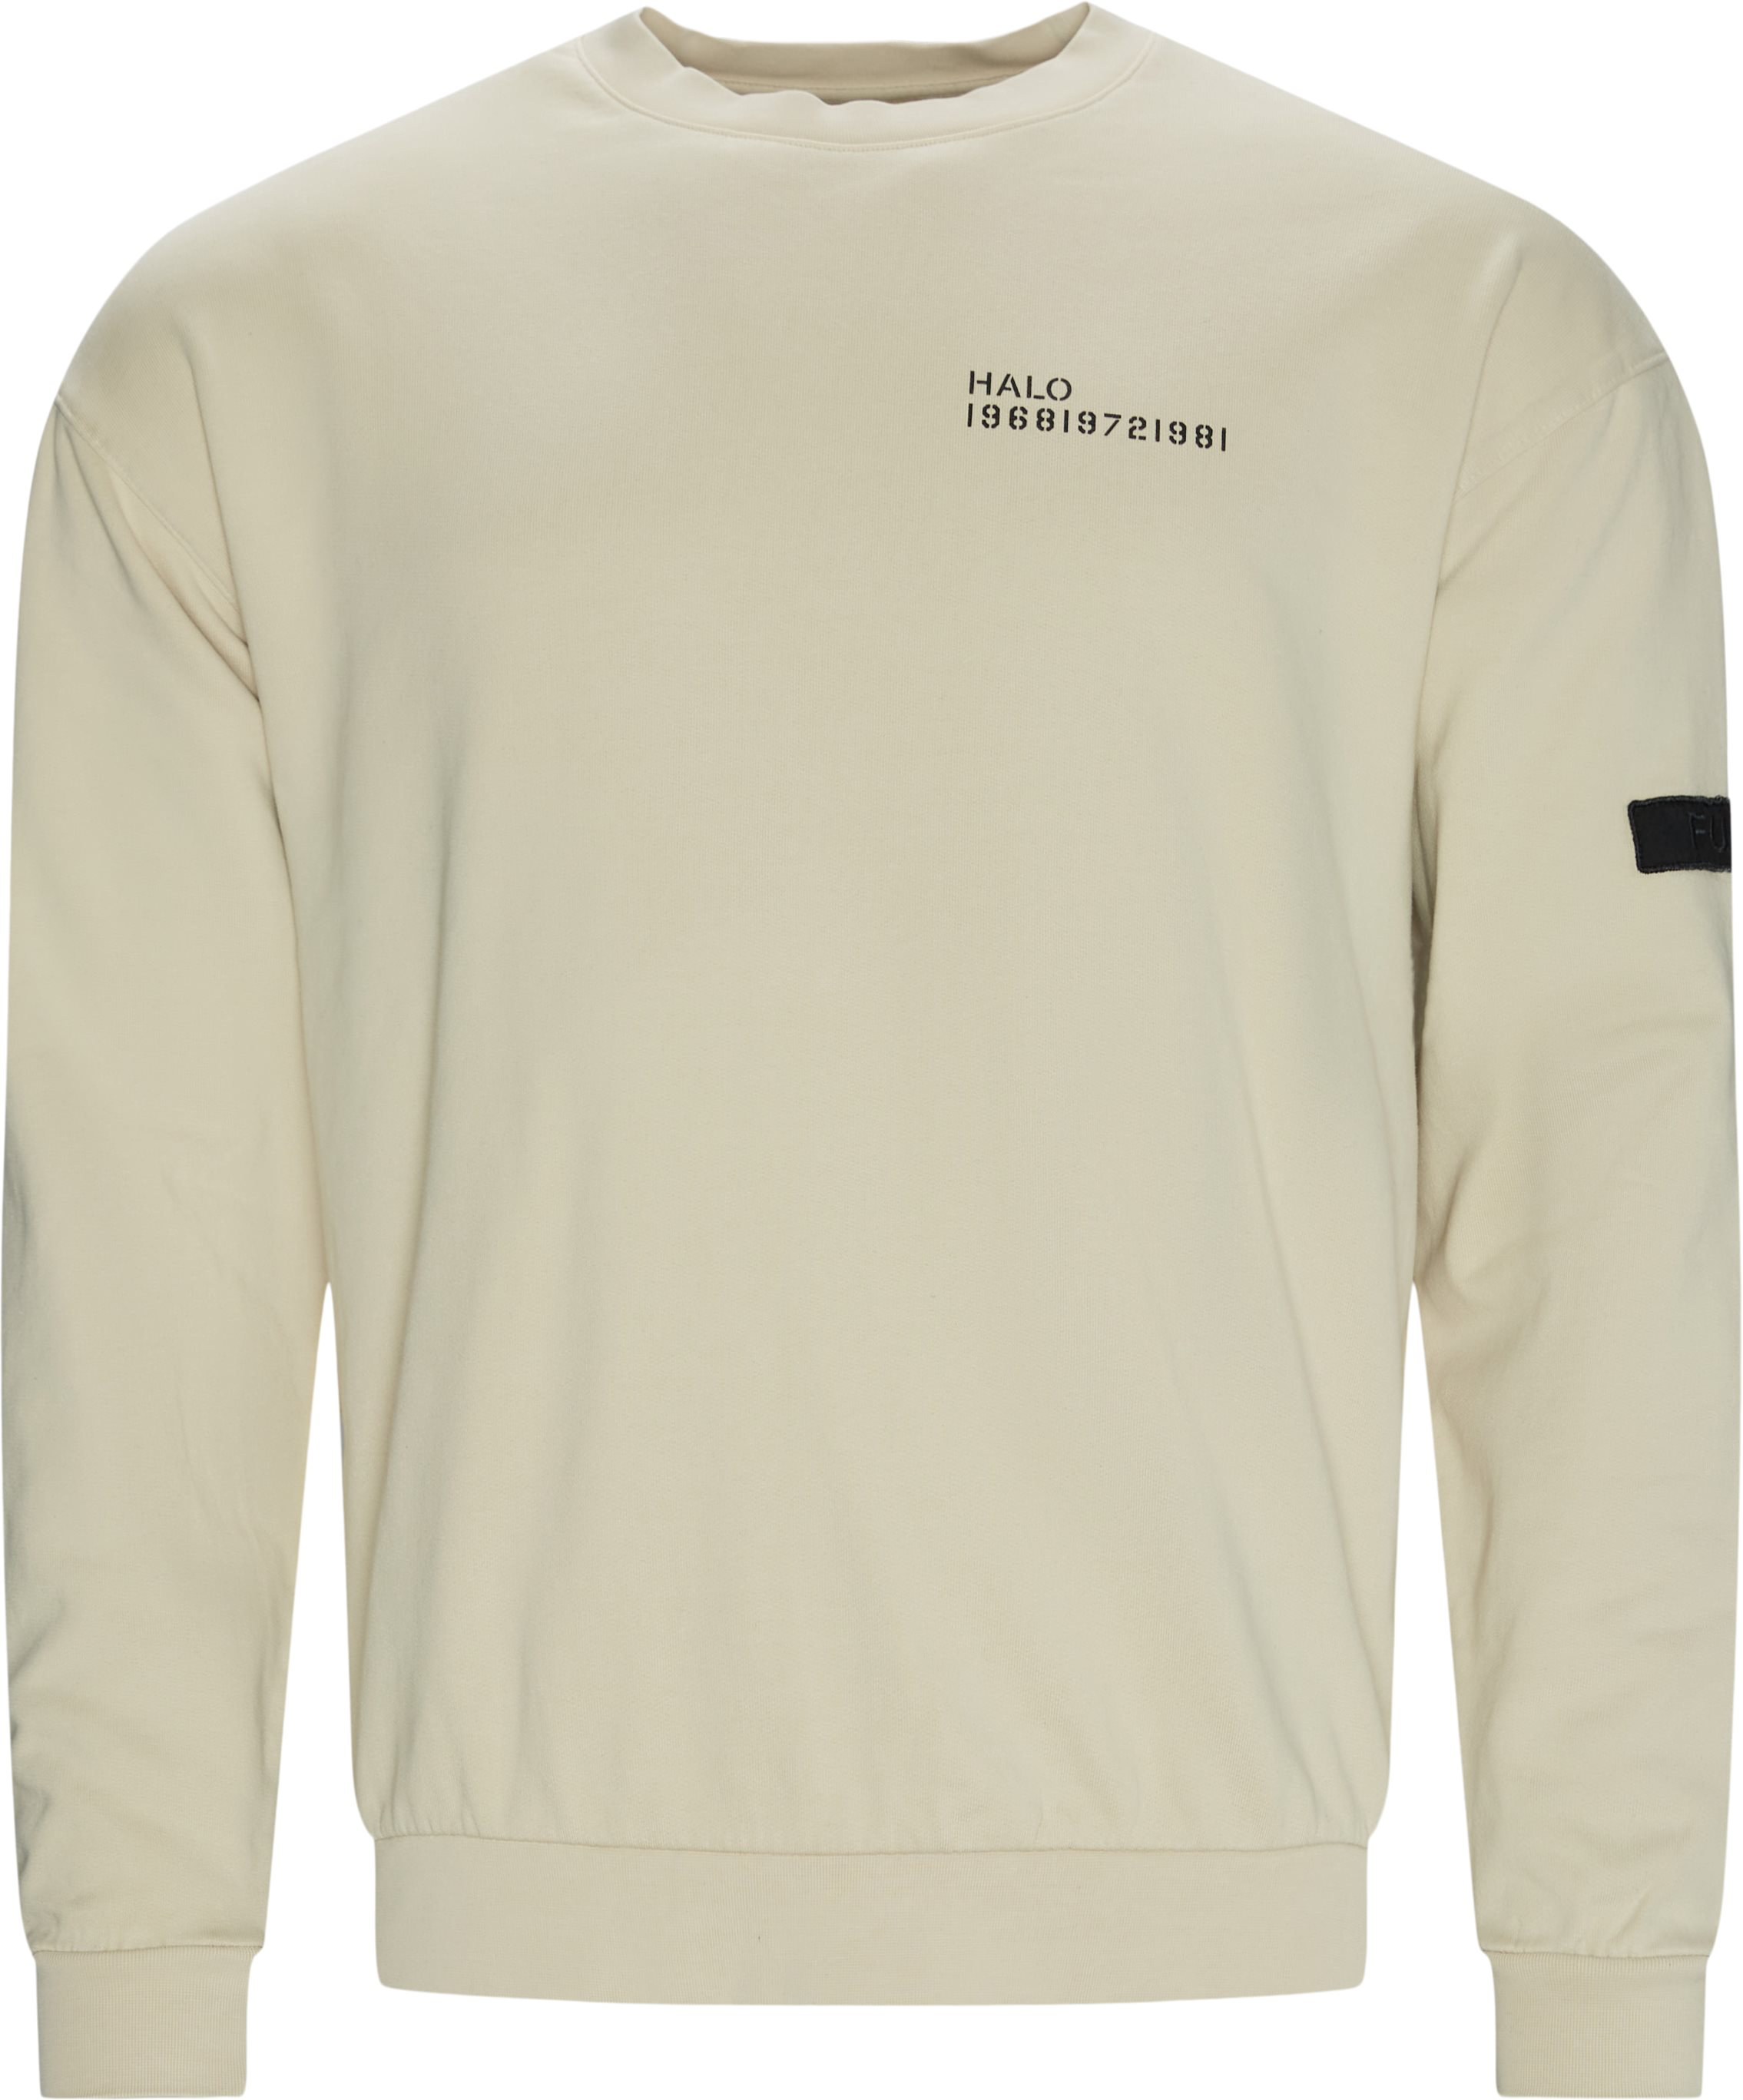 Cotton Crewneck - Sweatshirts - Regular fit - Sand